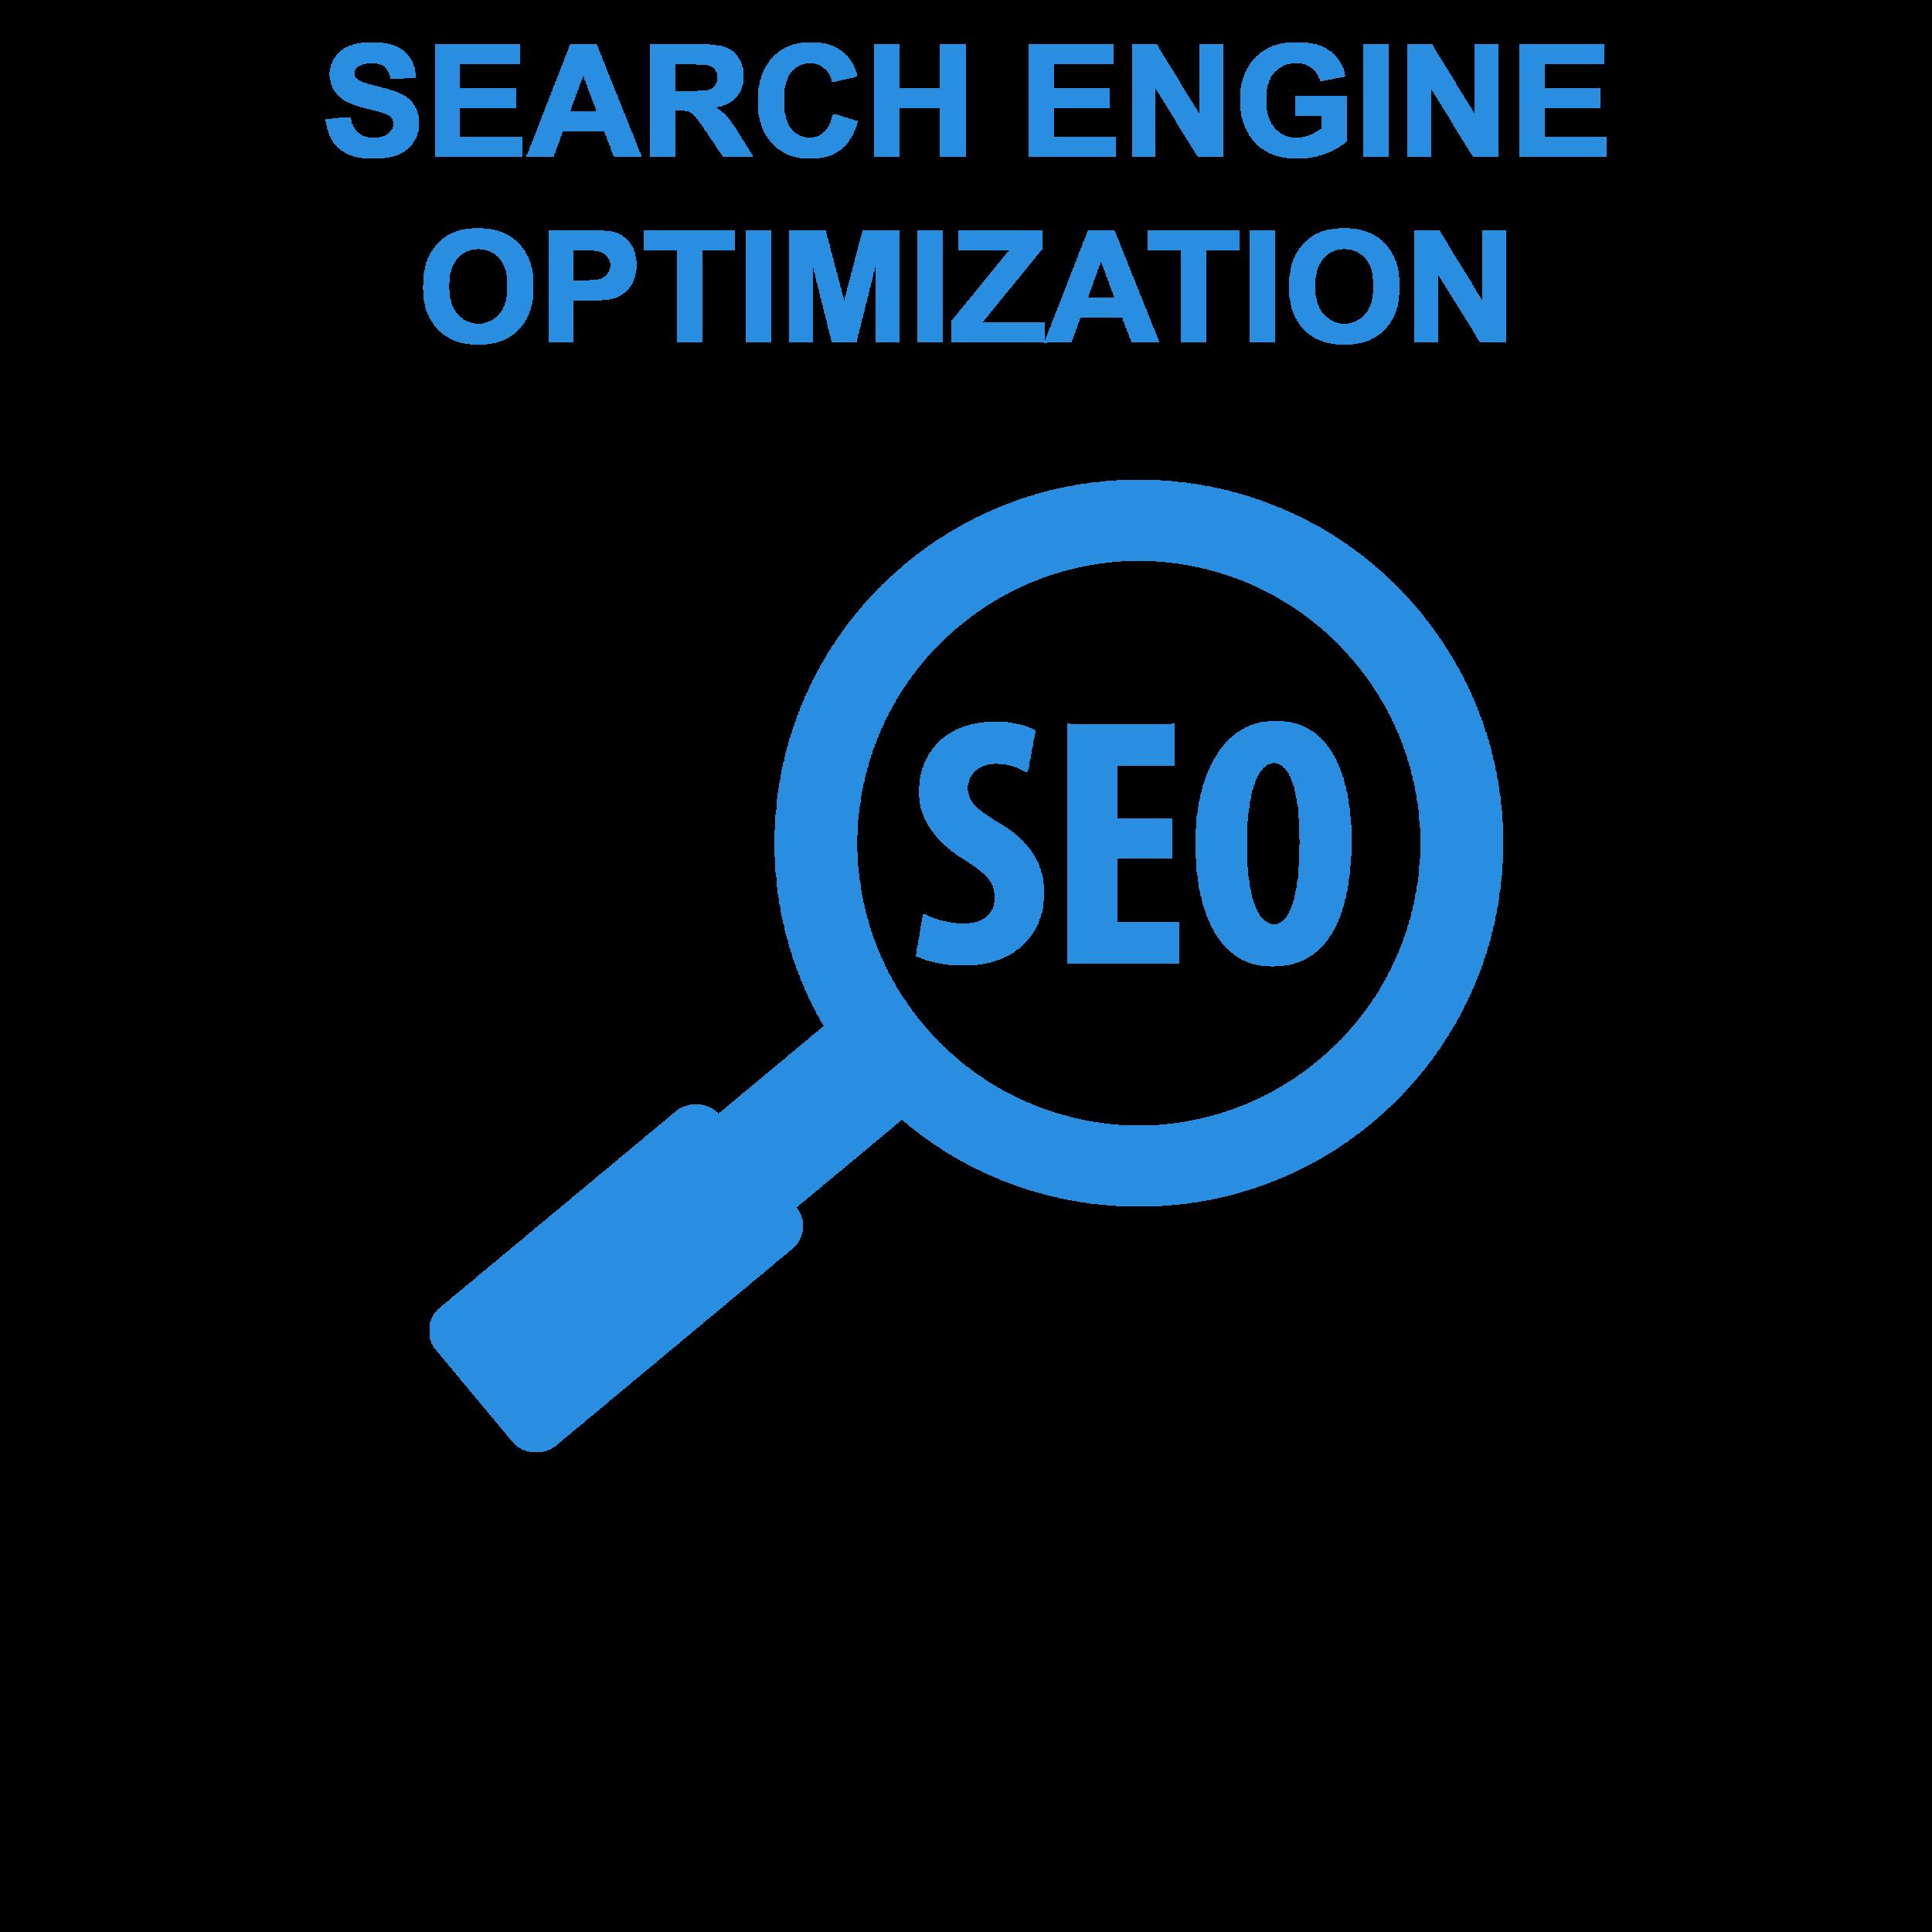 seo-search-engine-optimization-kotiadis-consulting.png